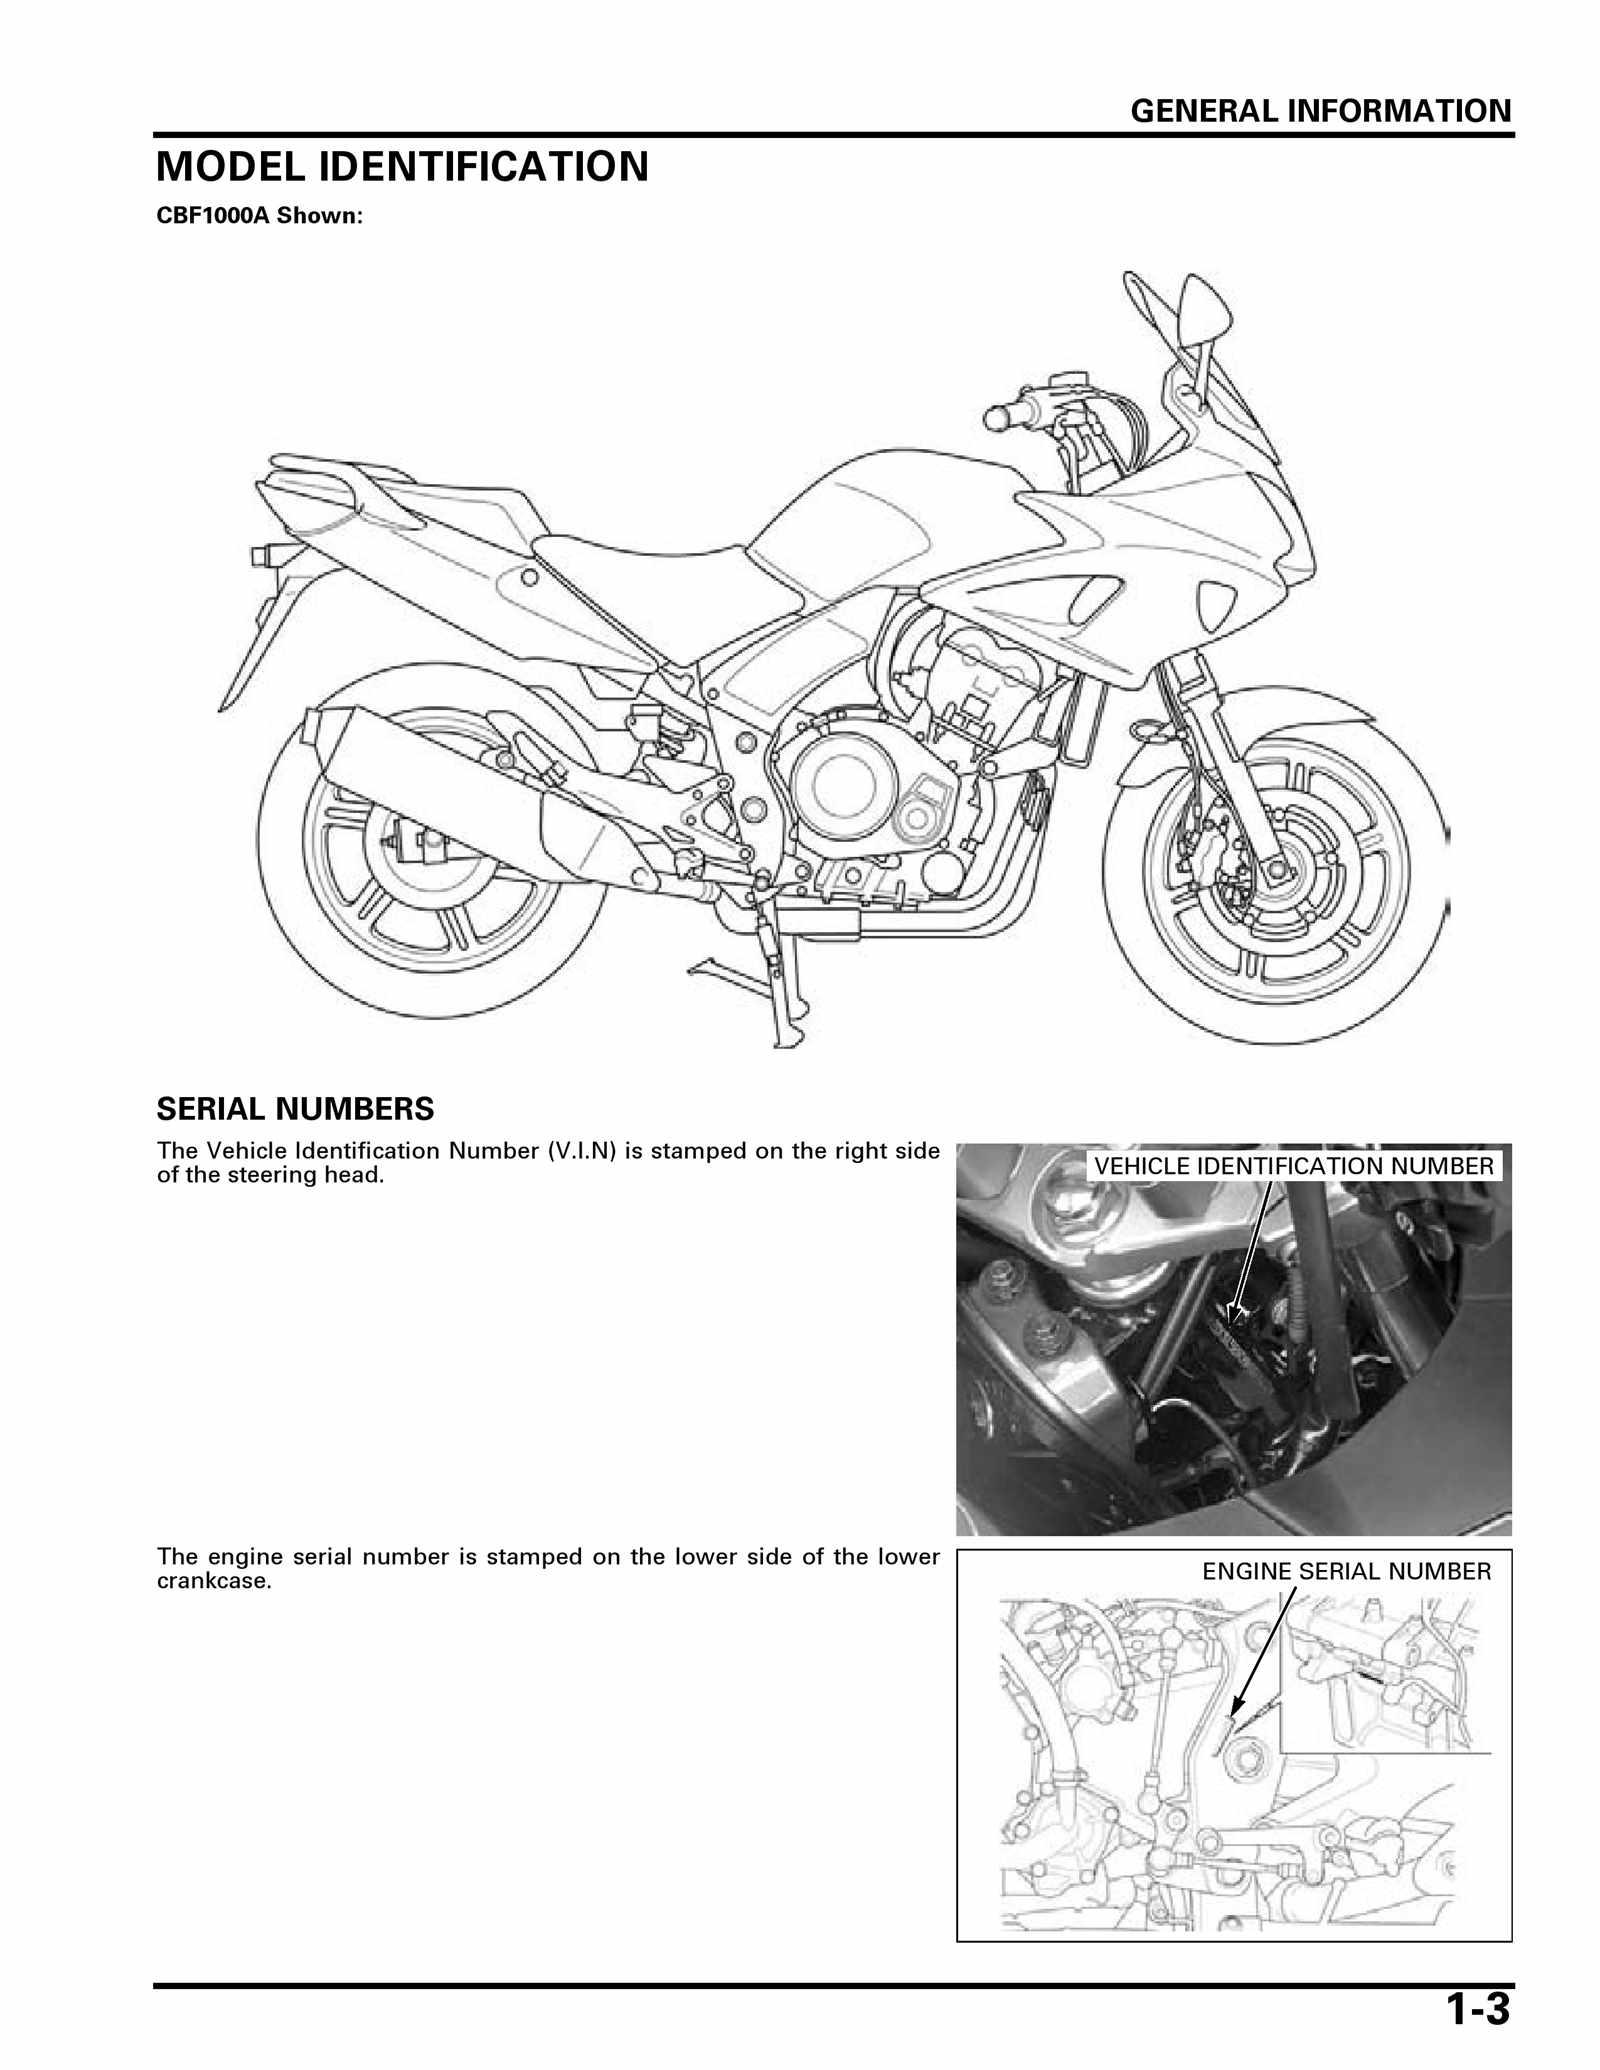 Honda CBF1000 A 2006-2008 Service Manual Free Download